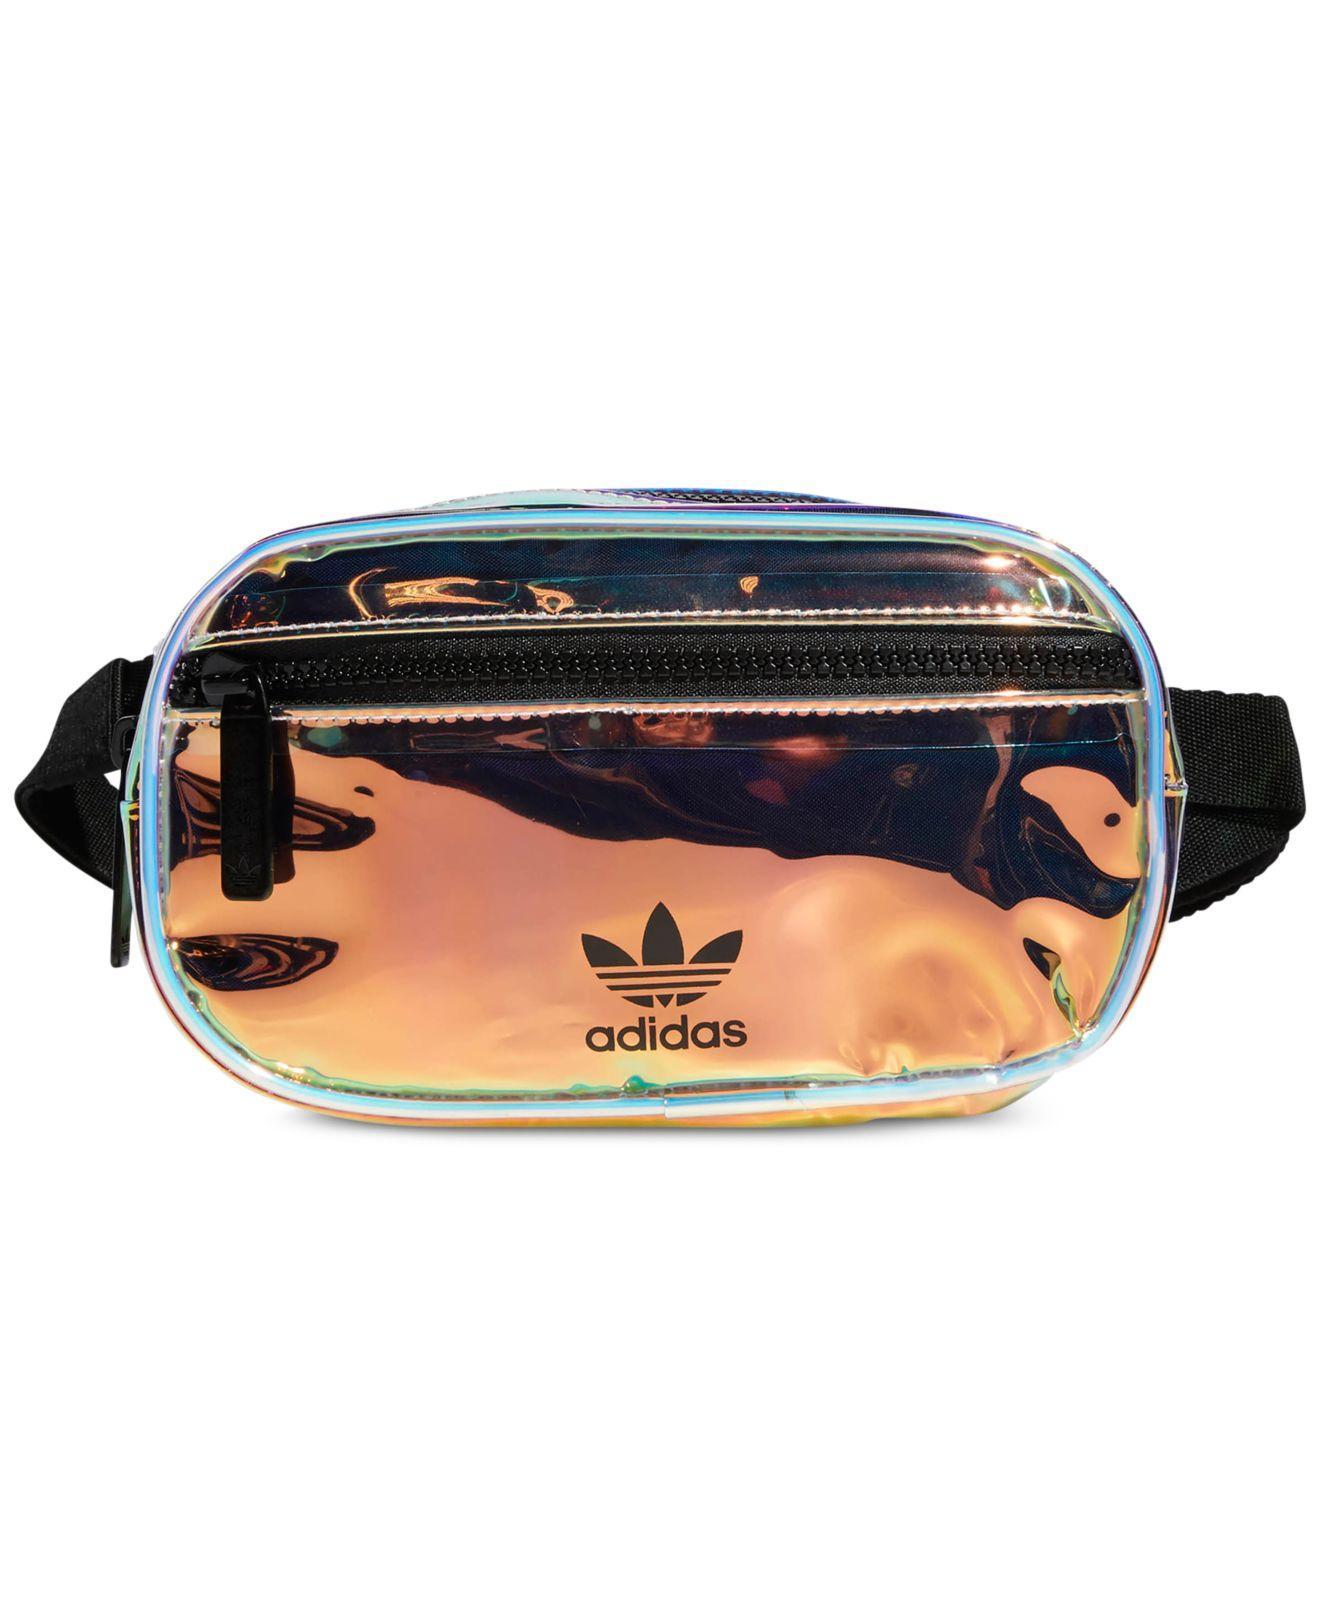 231480a71dc1 Adidas - Multicolor Originals Iridescent Waist Pack - Lyst. View fullscreen